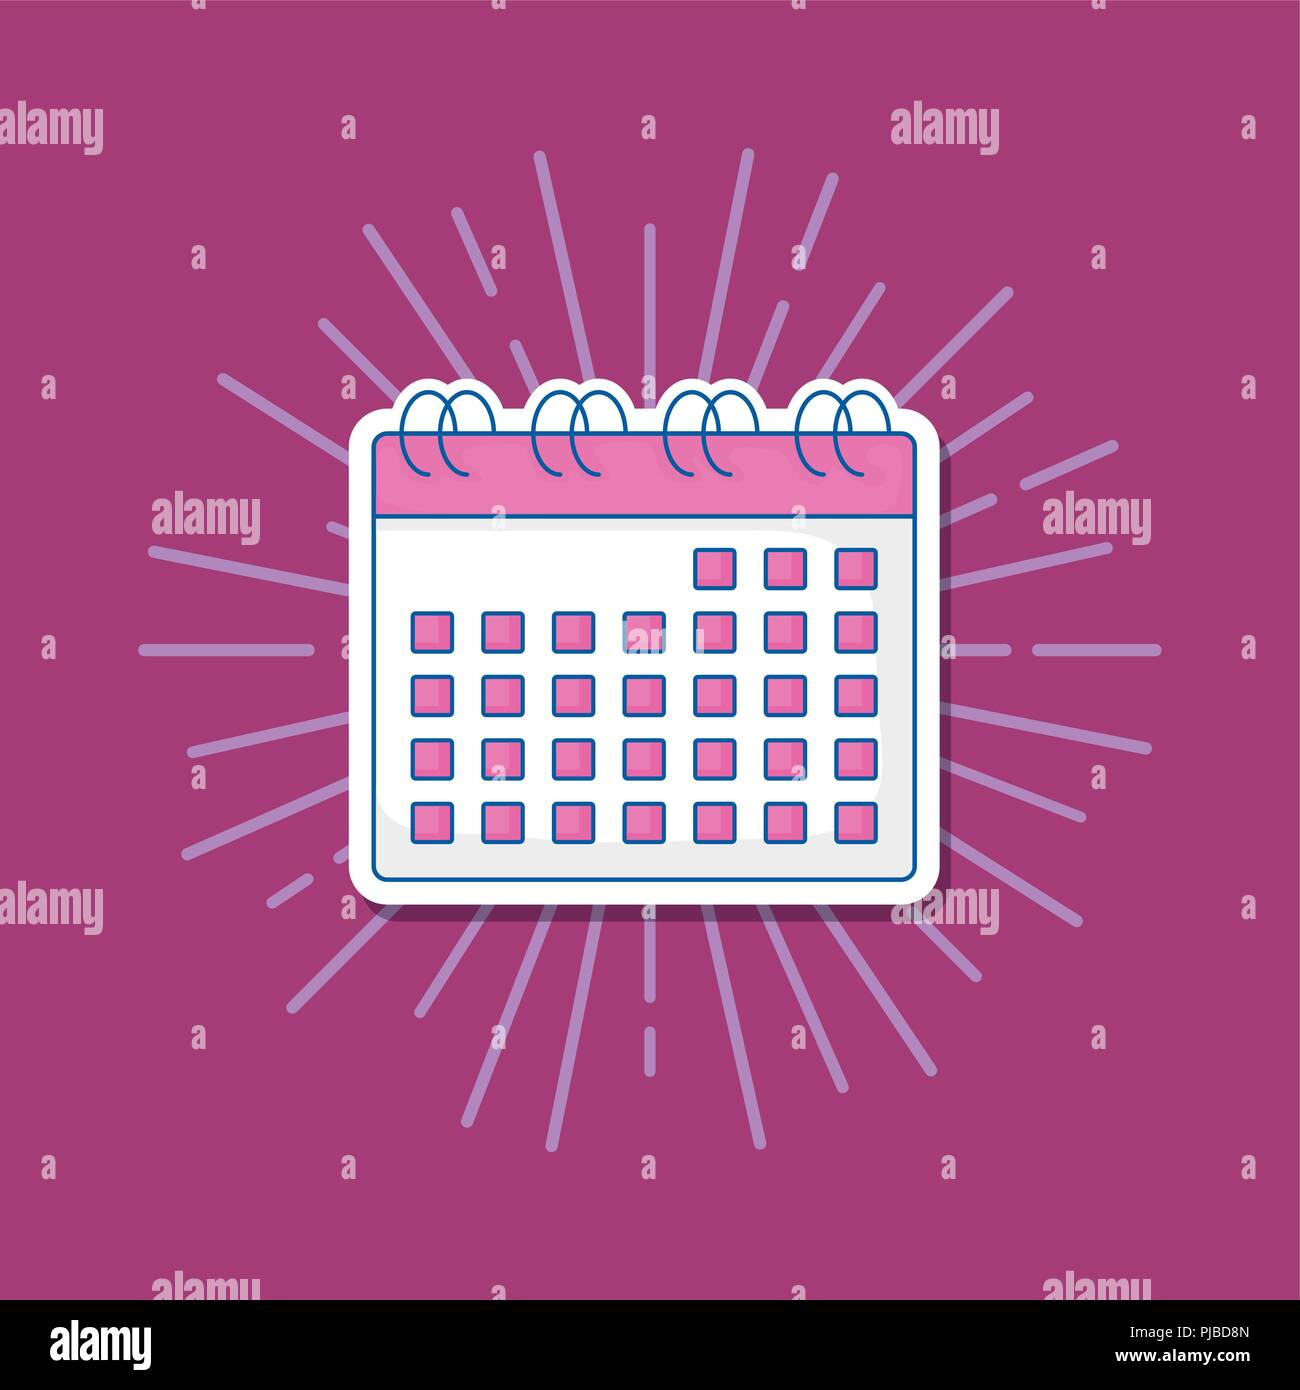 Wedding Celebration Card With Calendar Vector Illustration Design